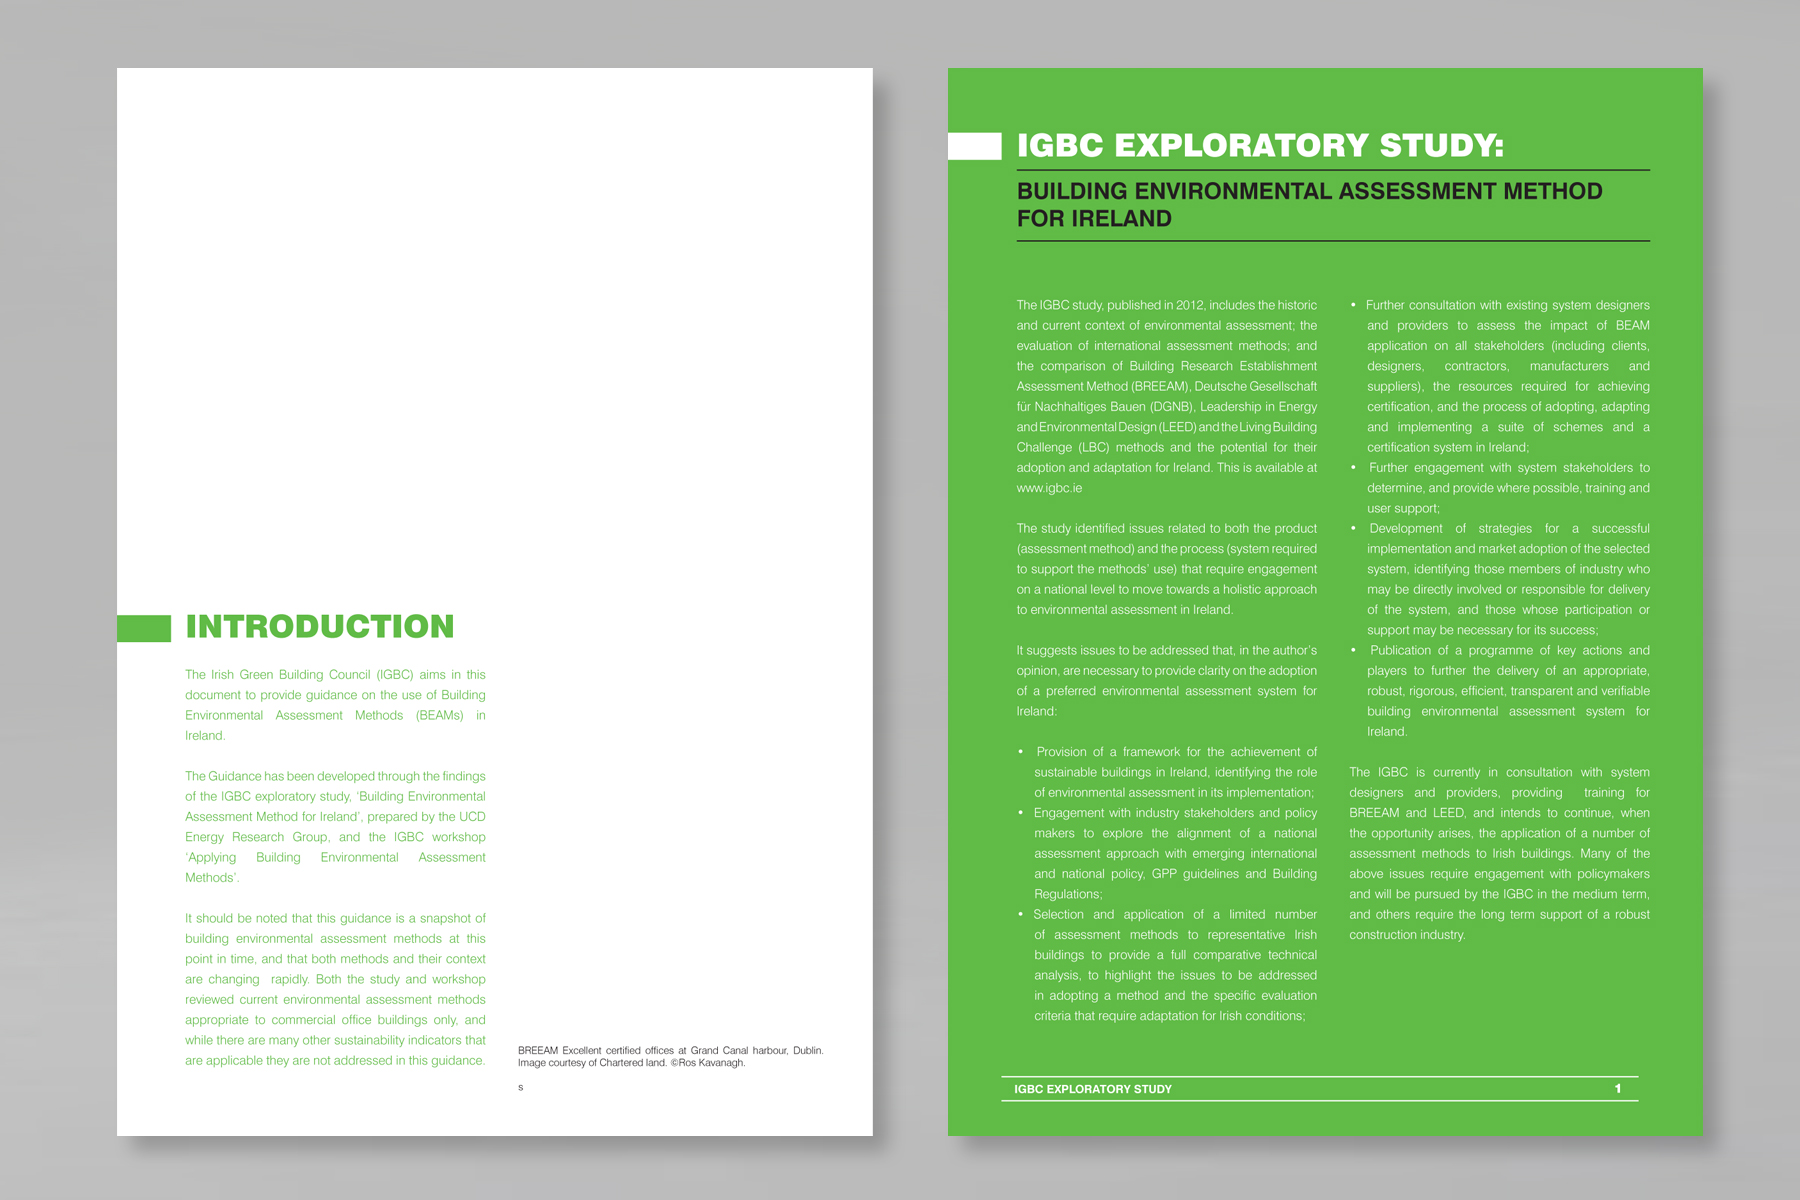 IGBC-annual-report6.jpg